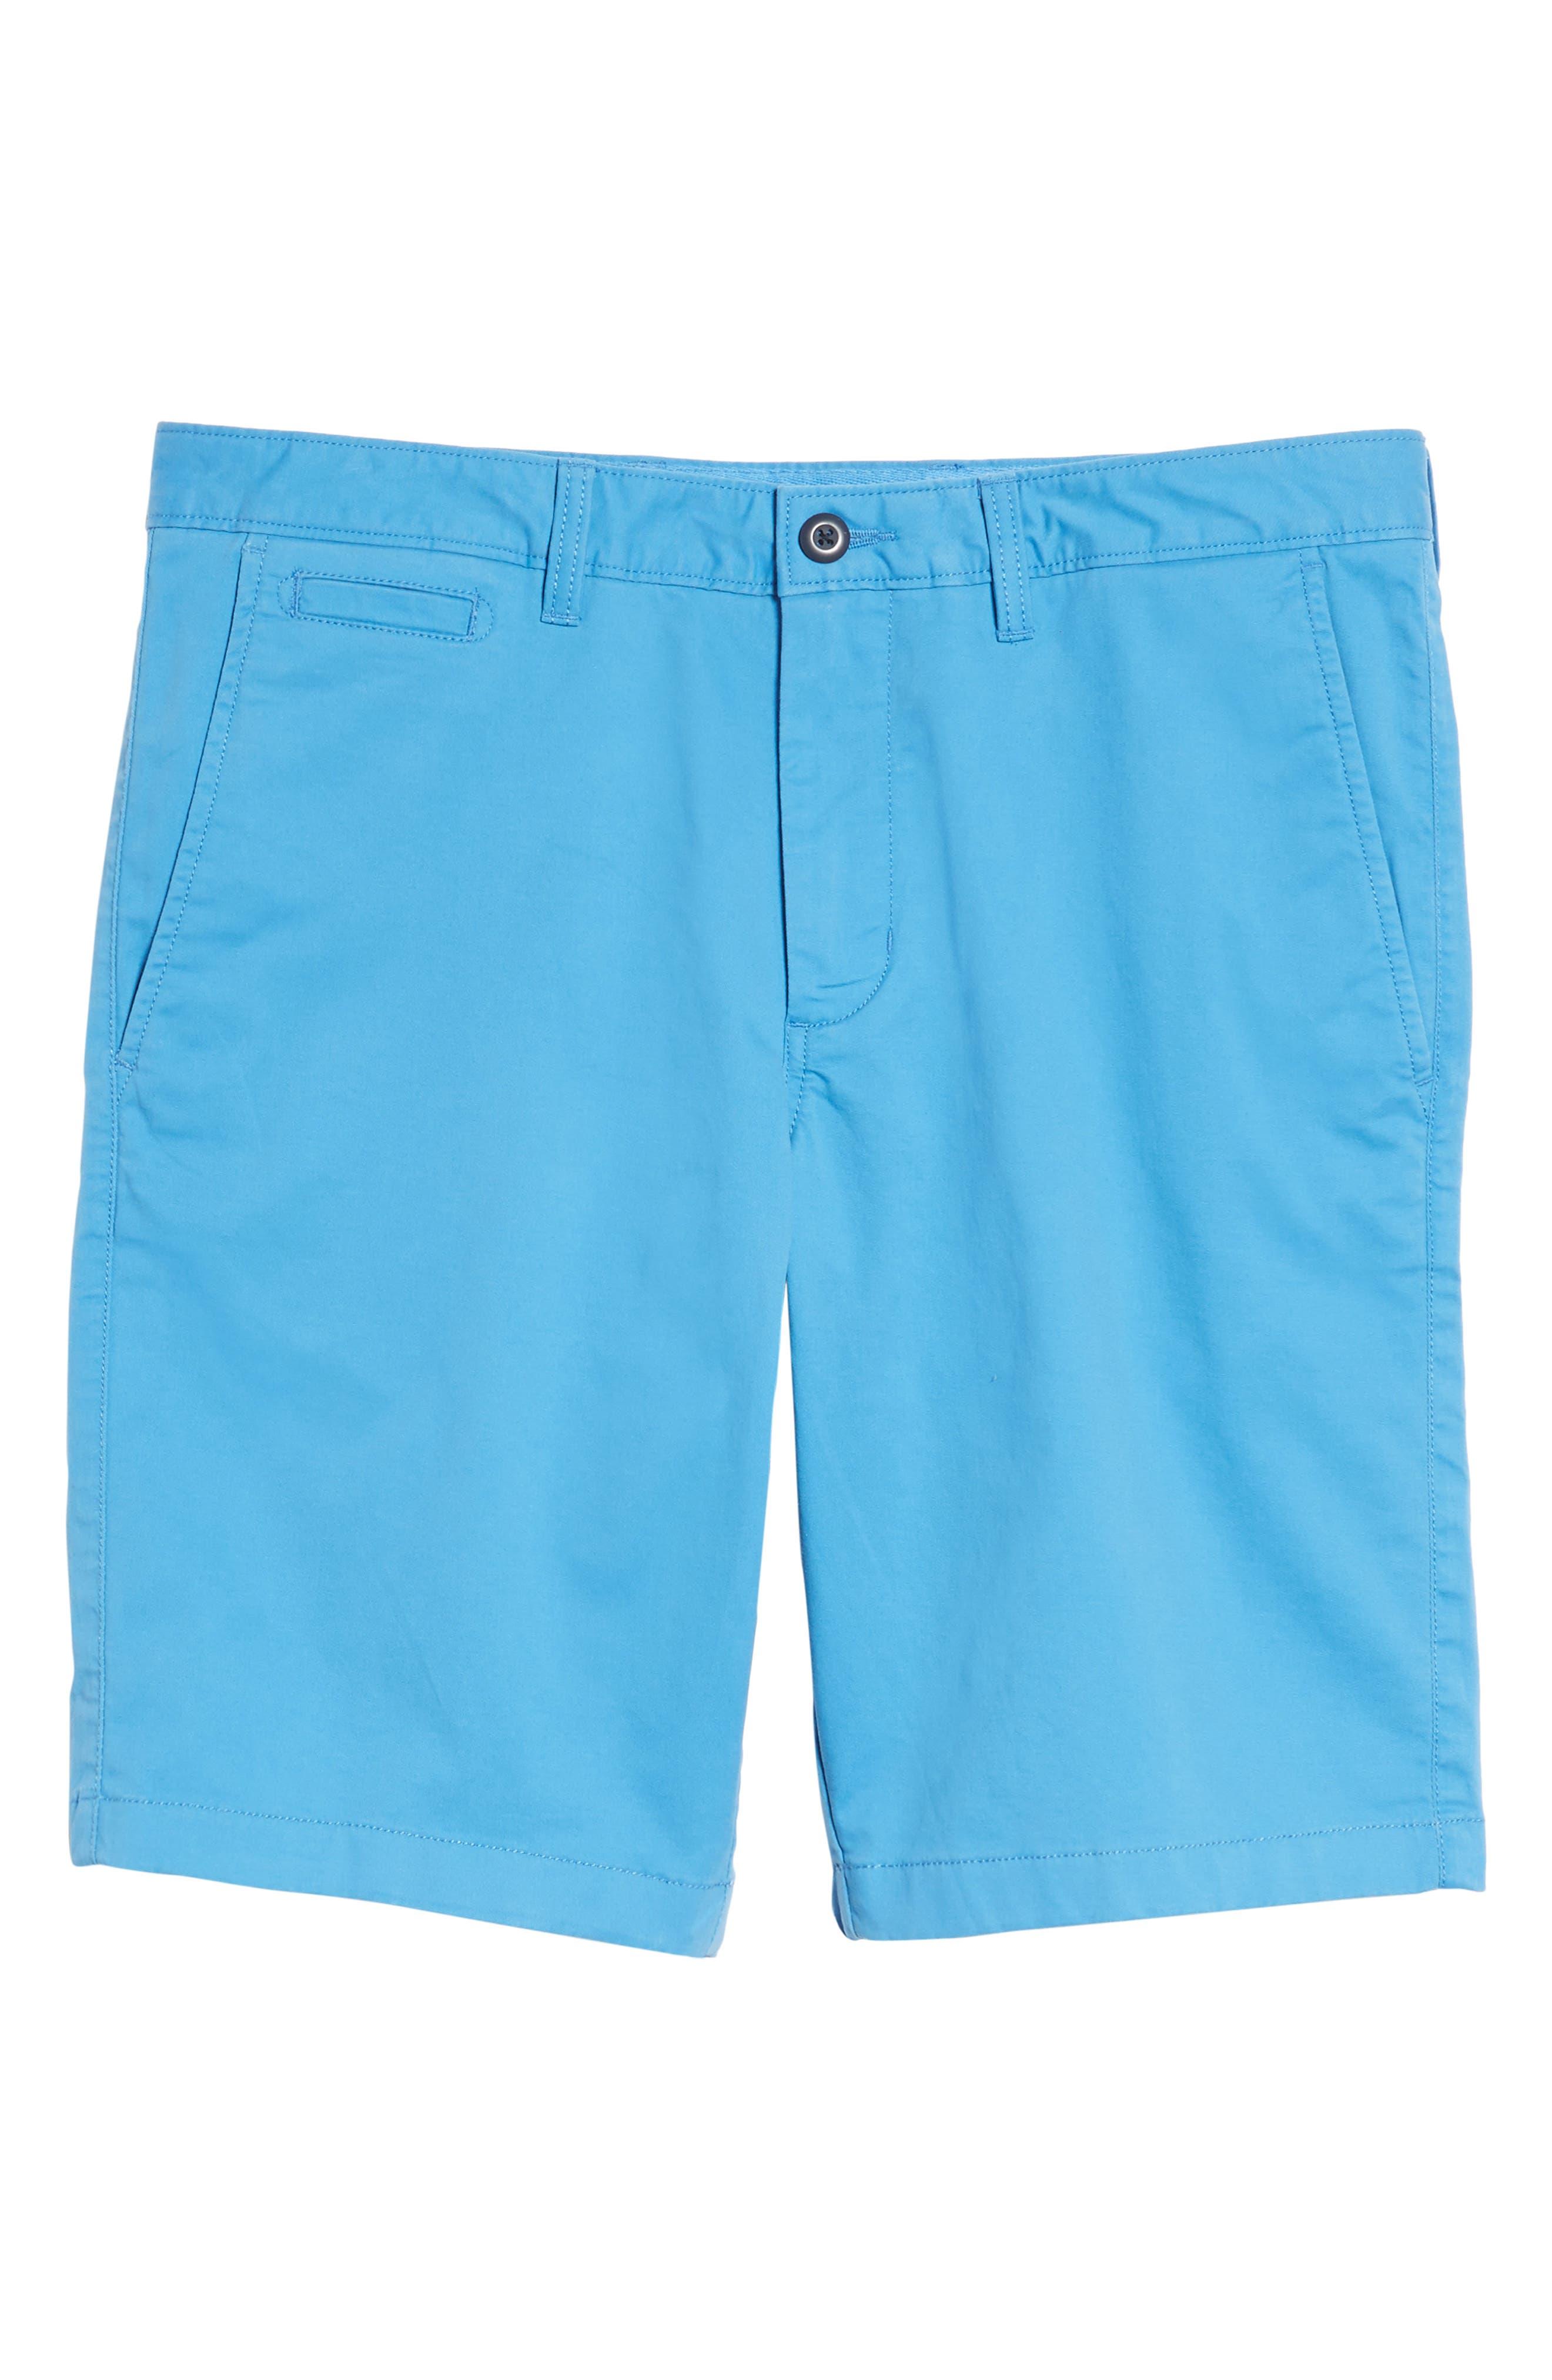 Ballard Slim Fit Stretch Chino 11-Inch Shorts,                             Alternate thumbnail 84, color,